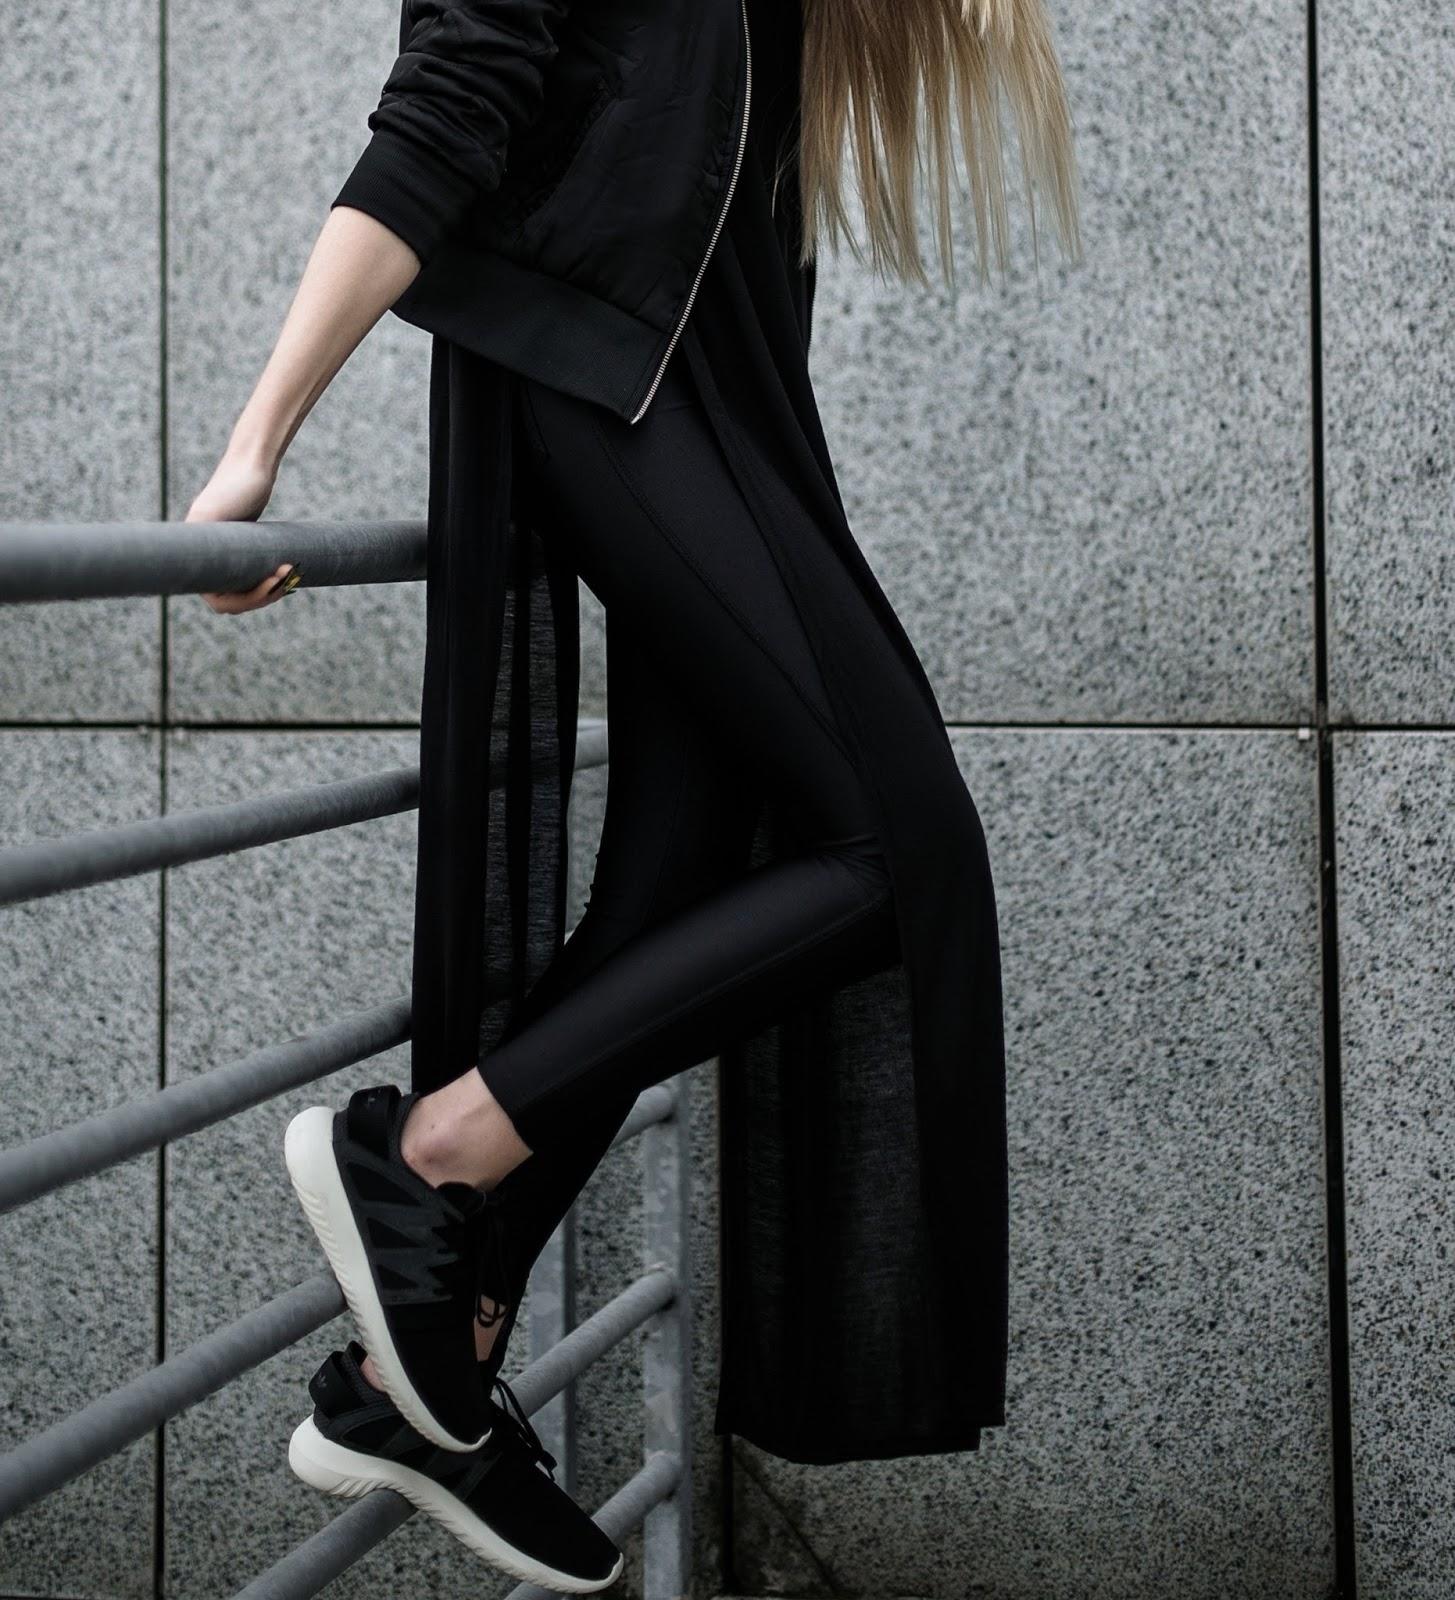 Adidas Tubular Viral Tumblr